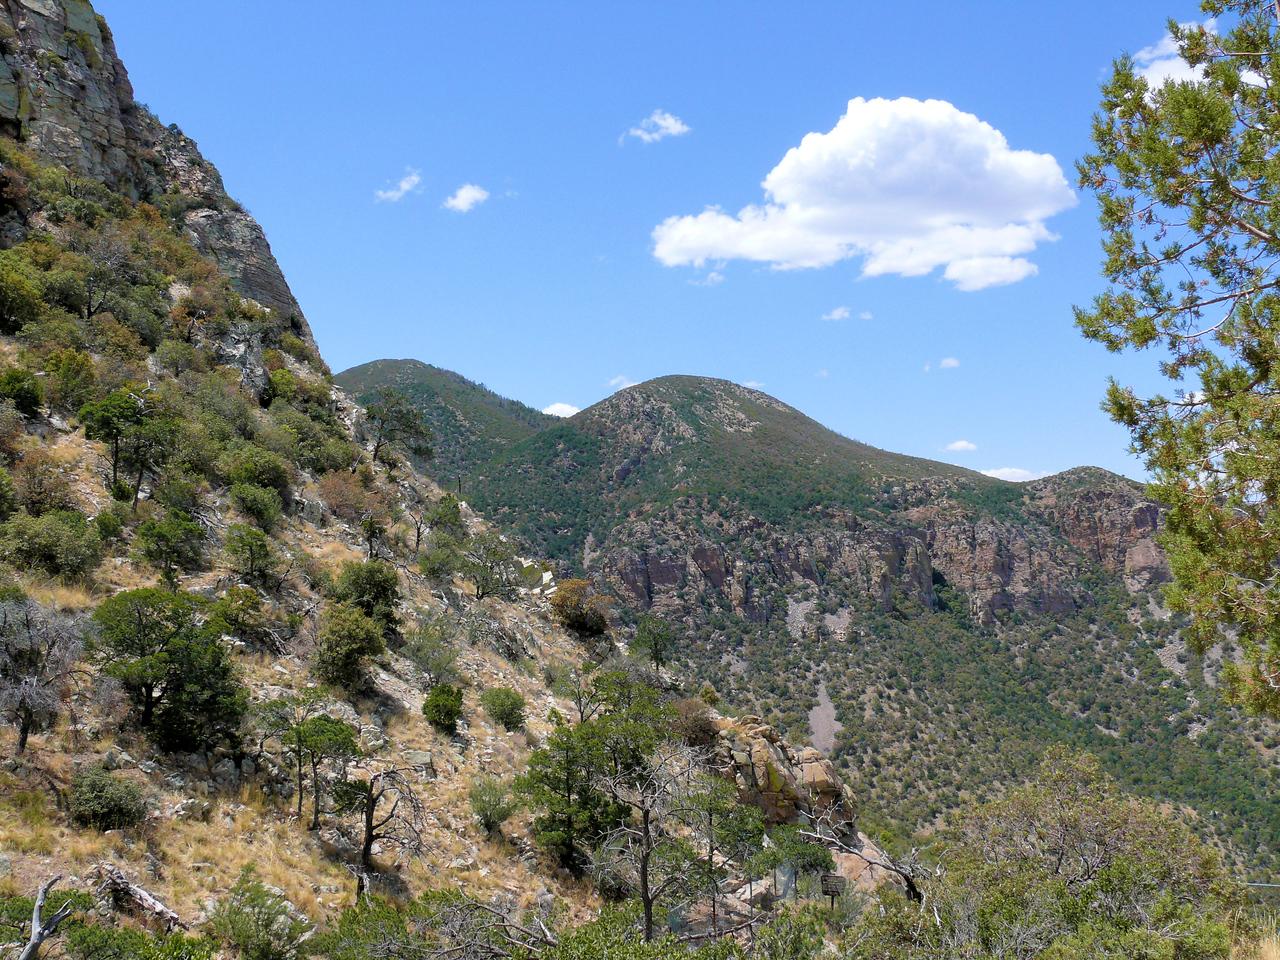 Carr Canyon Mountain View